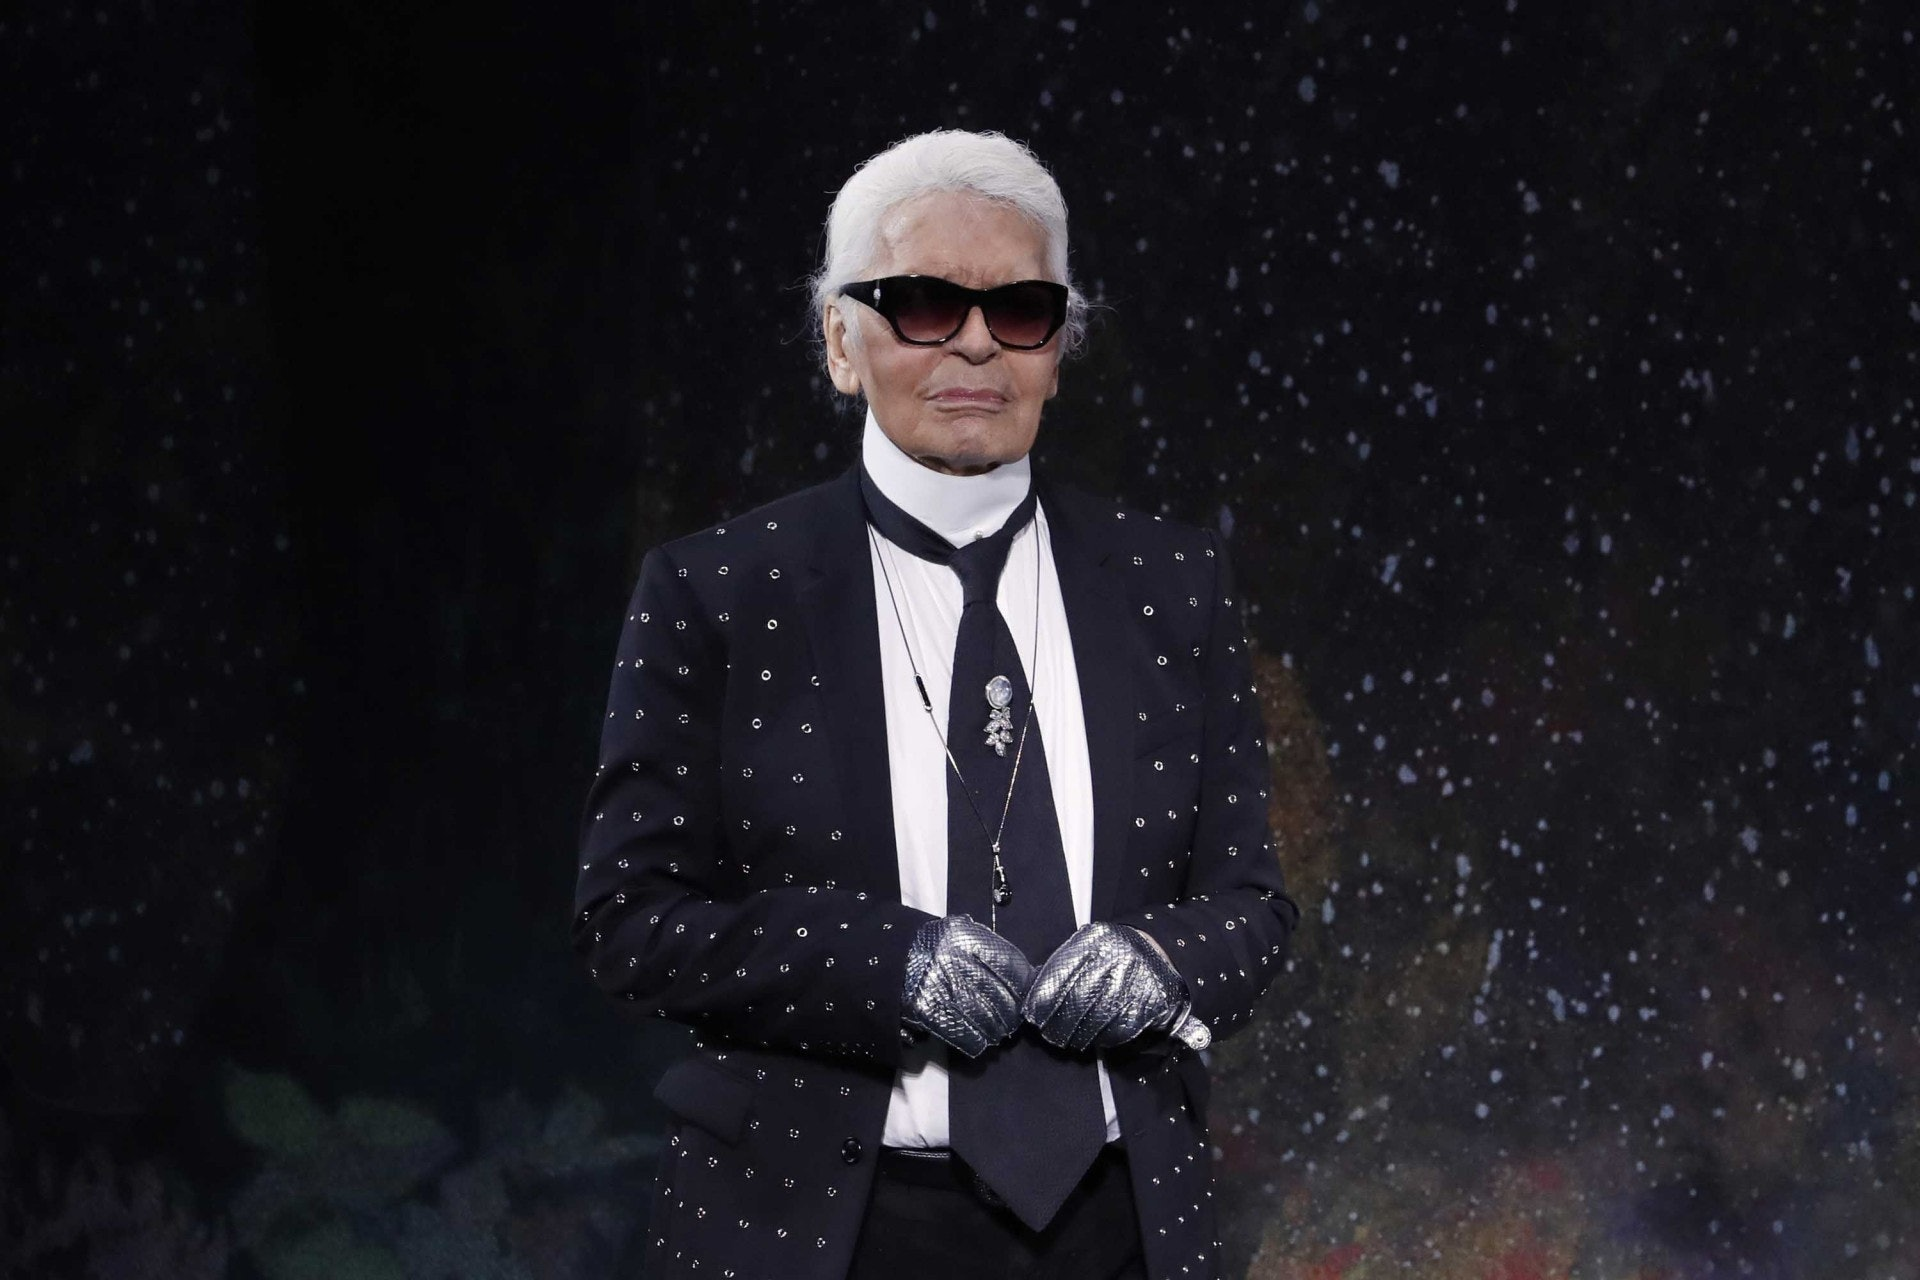 CHANEL創意總監、有「老佛爺」之稱的卡爾拉格斐(Karl Lagerfeld)去年因胰臟癌離世。(CNN)